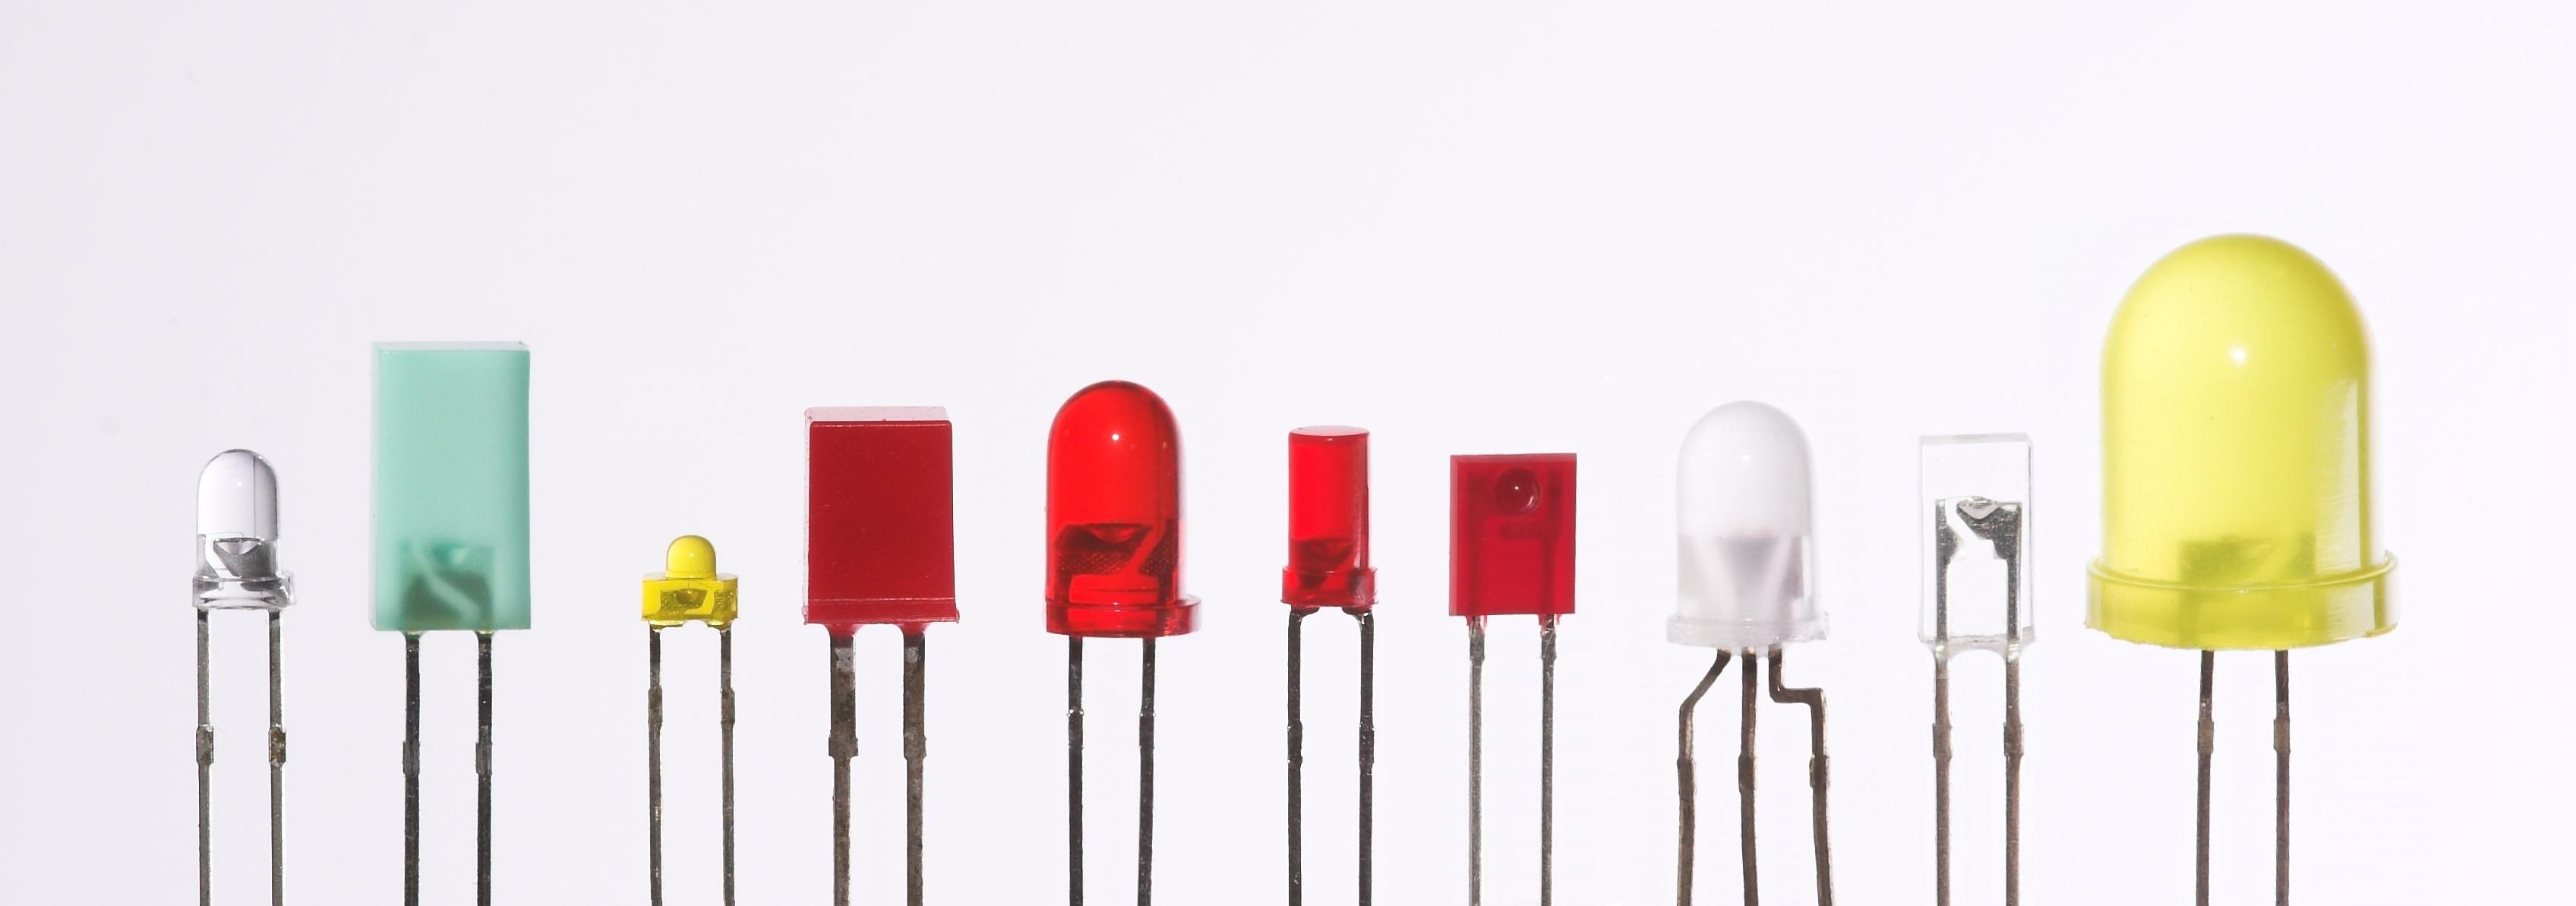 iluminación LED eficiente